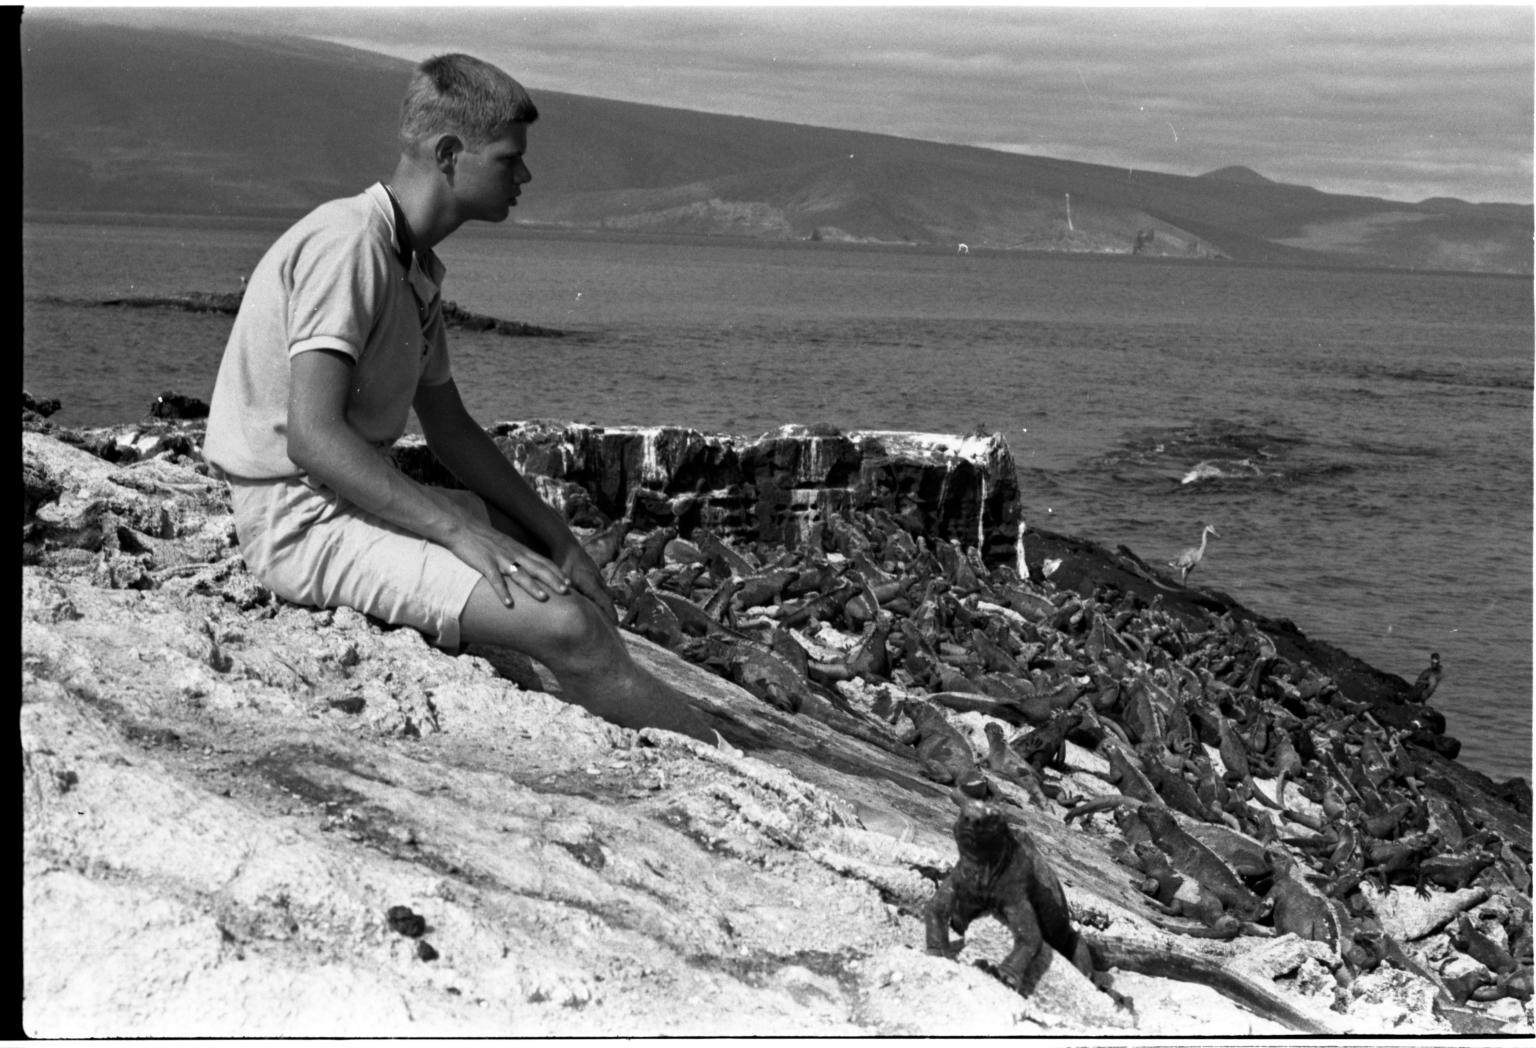 Jack Murphy with Marine Iguanas